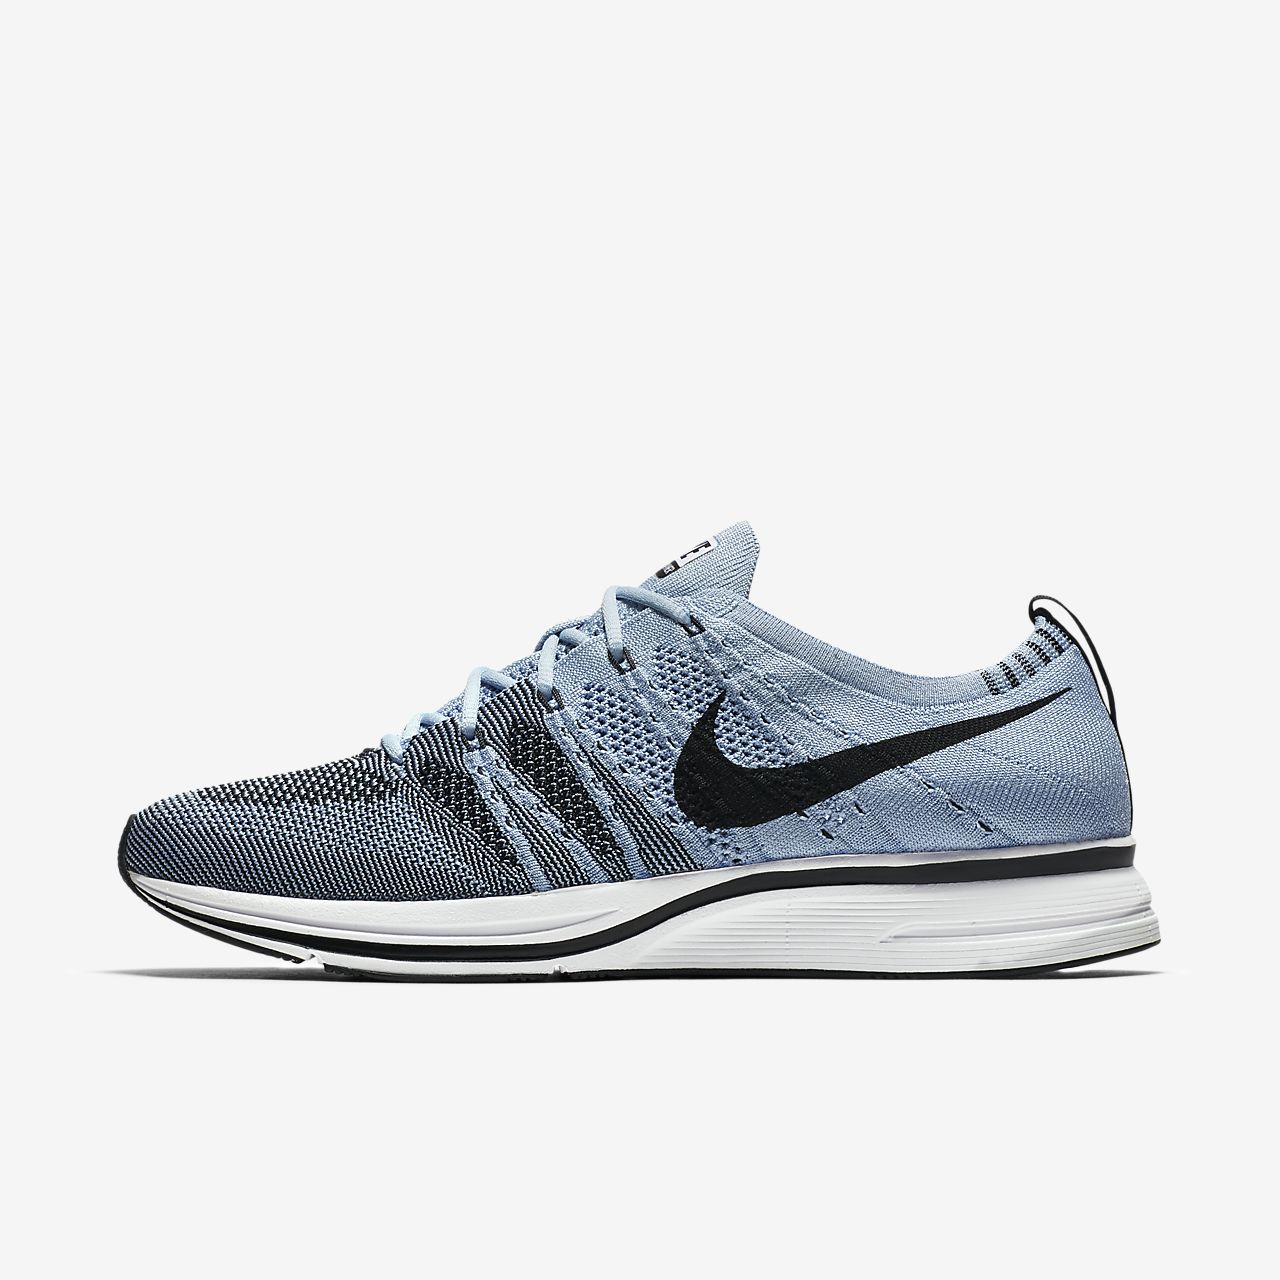 super popular ddb7a 0a9d6 nike free 3 run, Nike Lunar Hyperdunk 2016 Orange Blaze Black Basketball  Shoes,nike free 5.0 v4,professional online store, nike free run USA factory  outlet